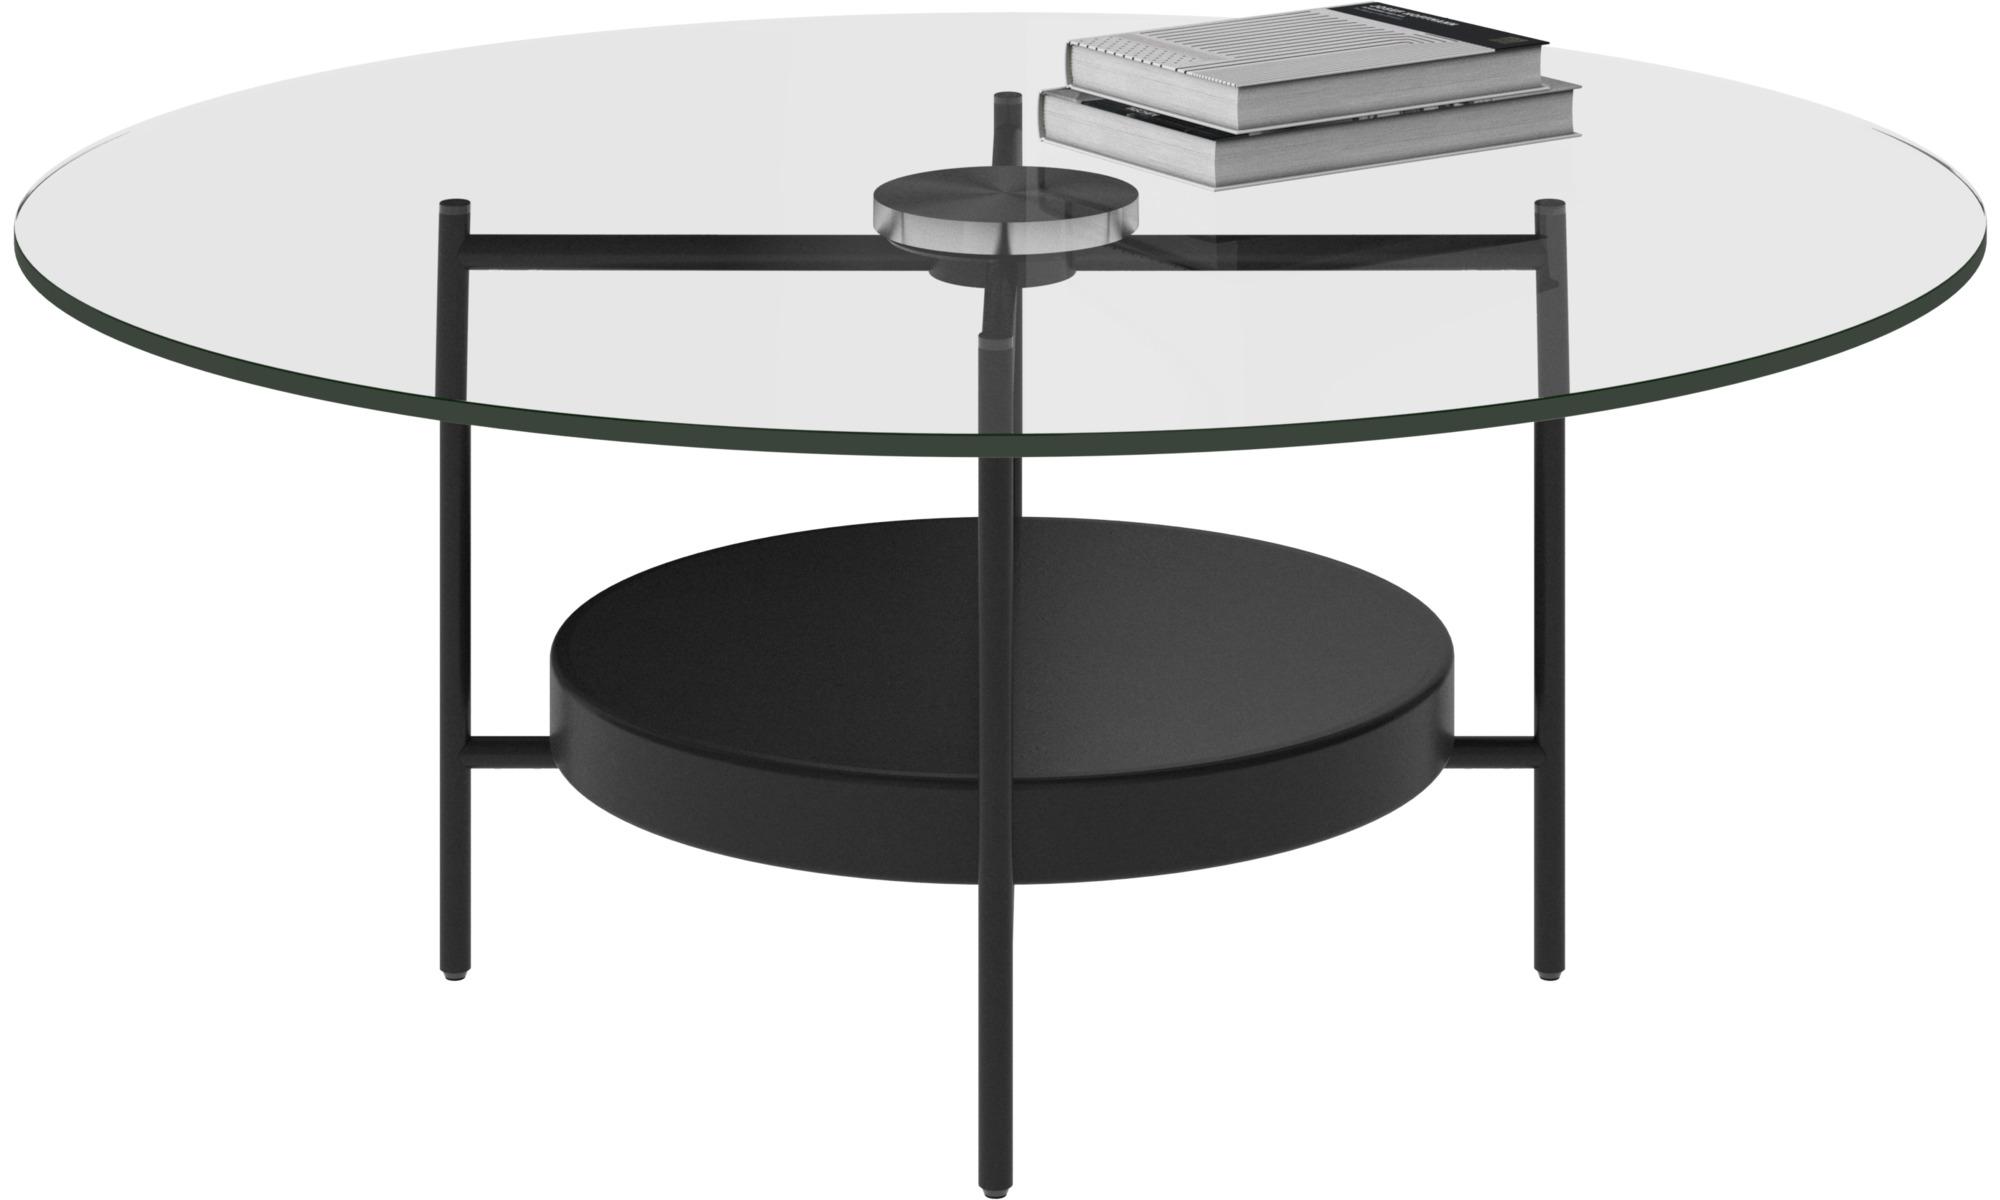 Tables basses - Table basse Madrid - rotonde - Verre transparent - Verre